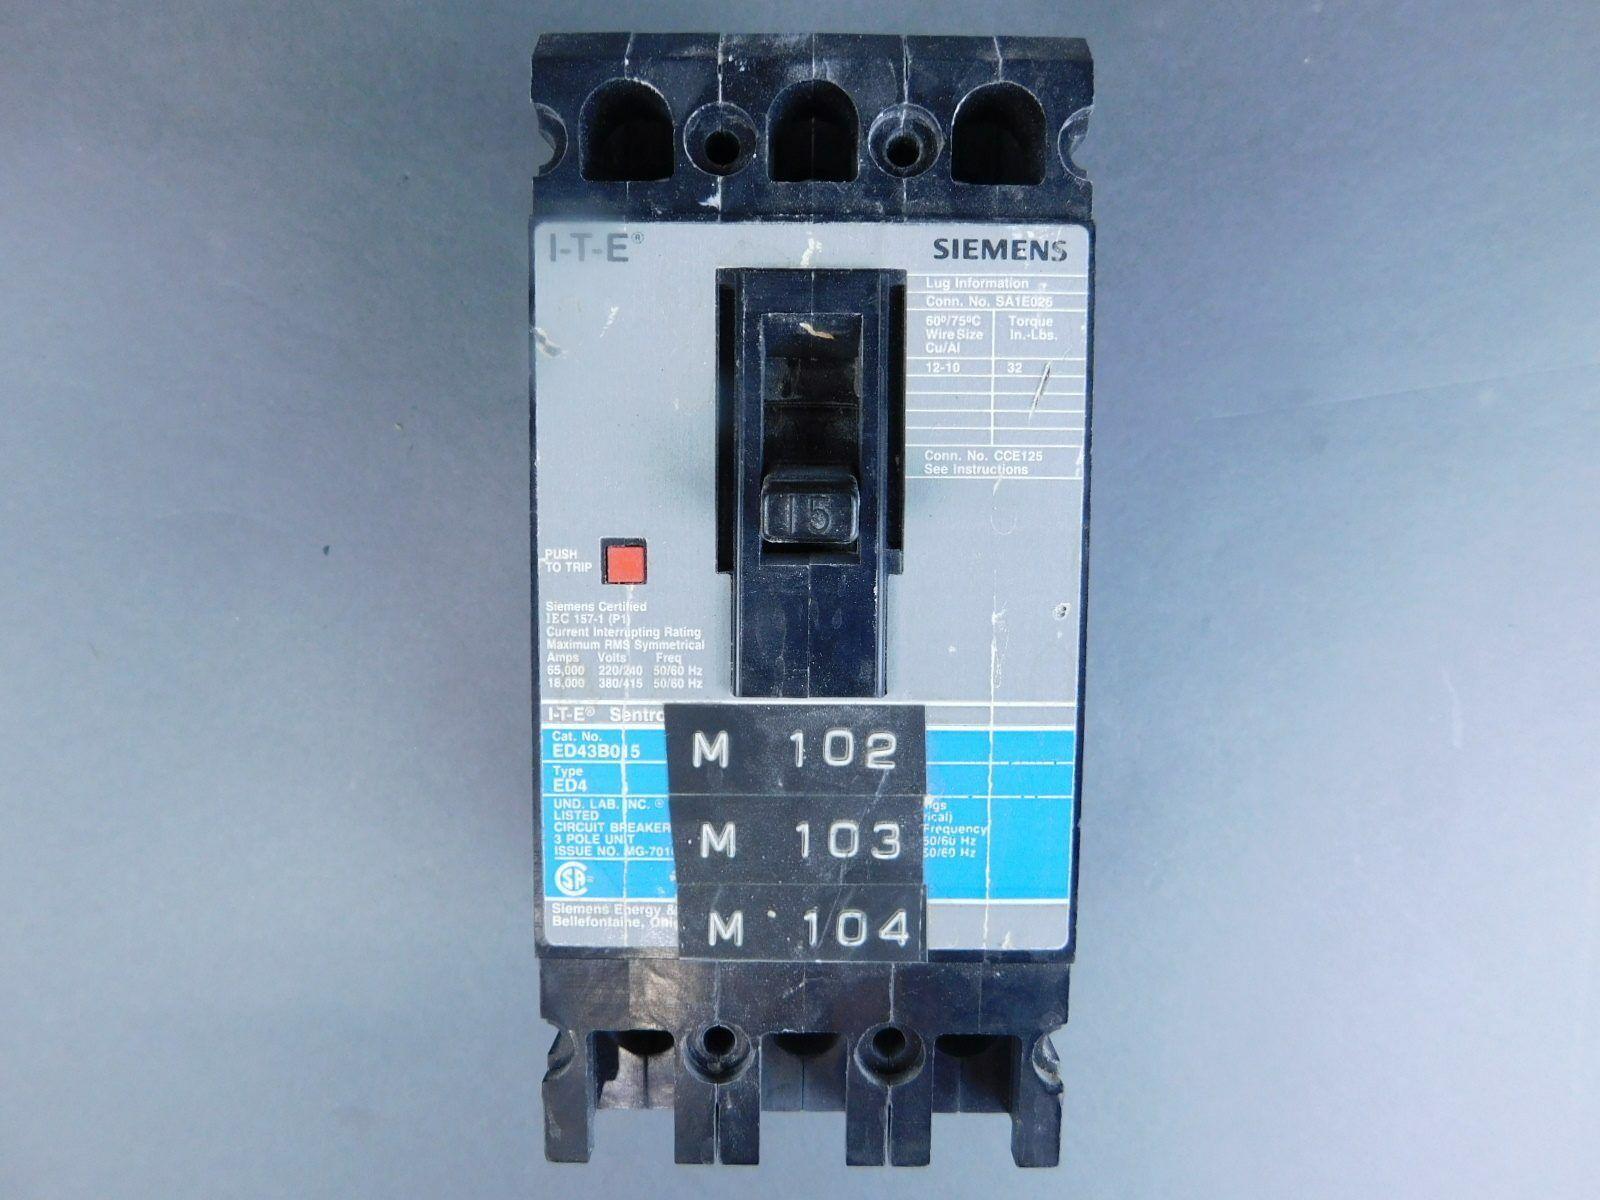 SIEMENS 15 AMP 3POLE 480VAC CIRCUIT BREAKER ED43B015 *kjs*